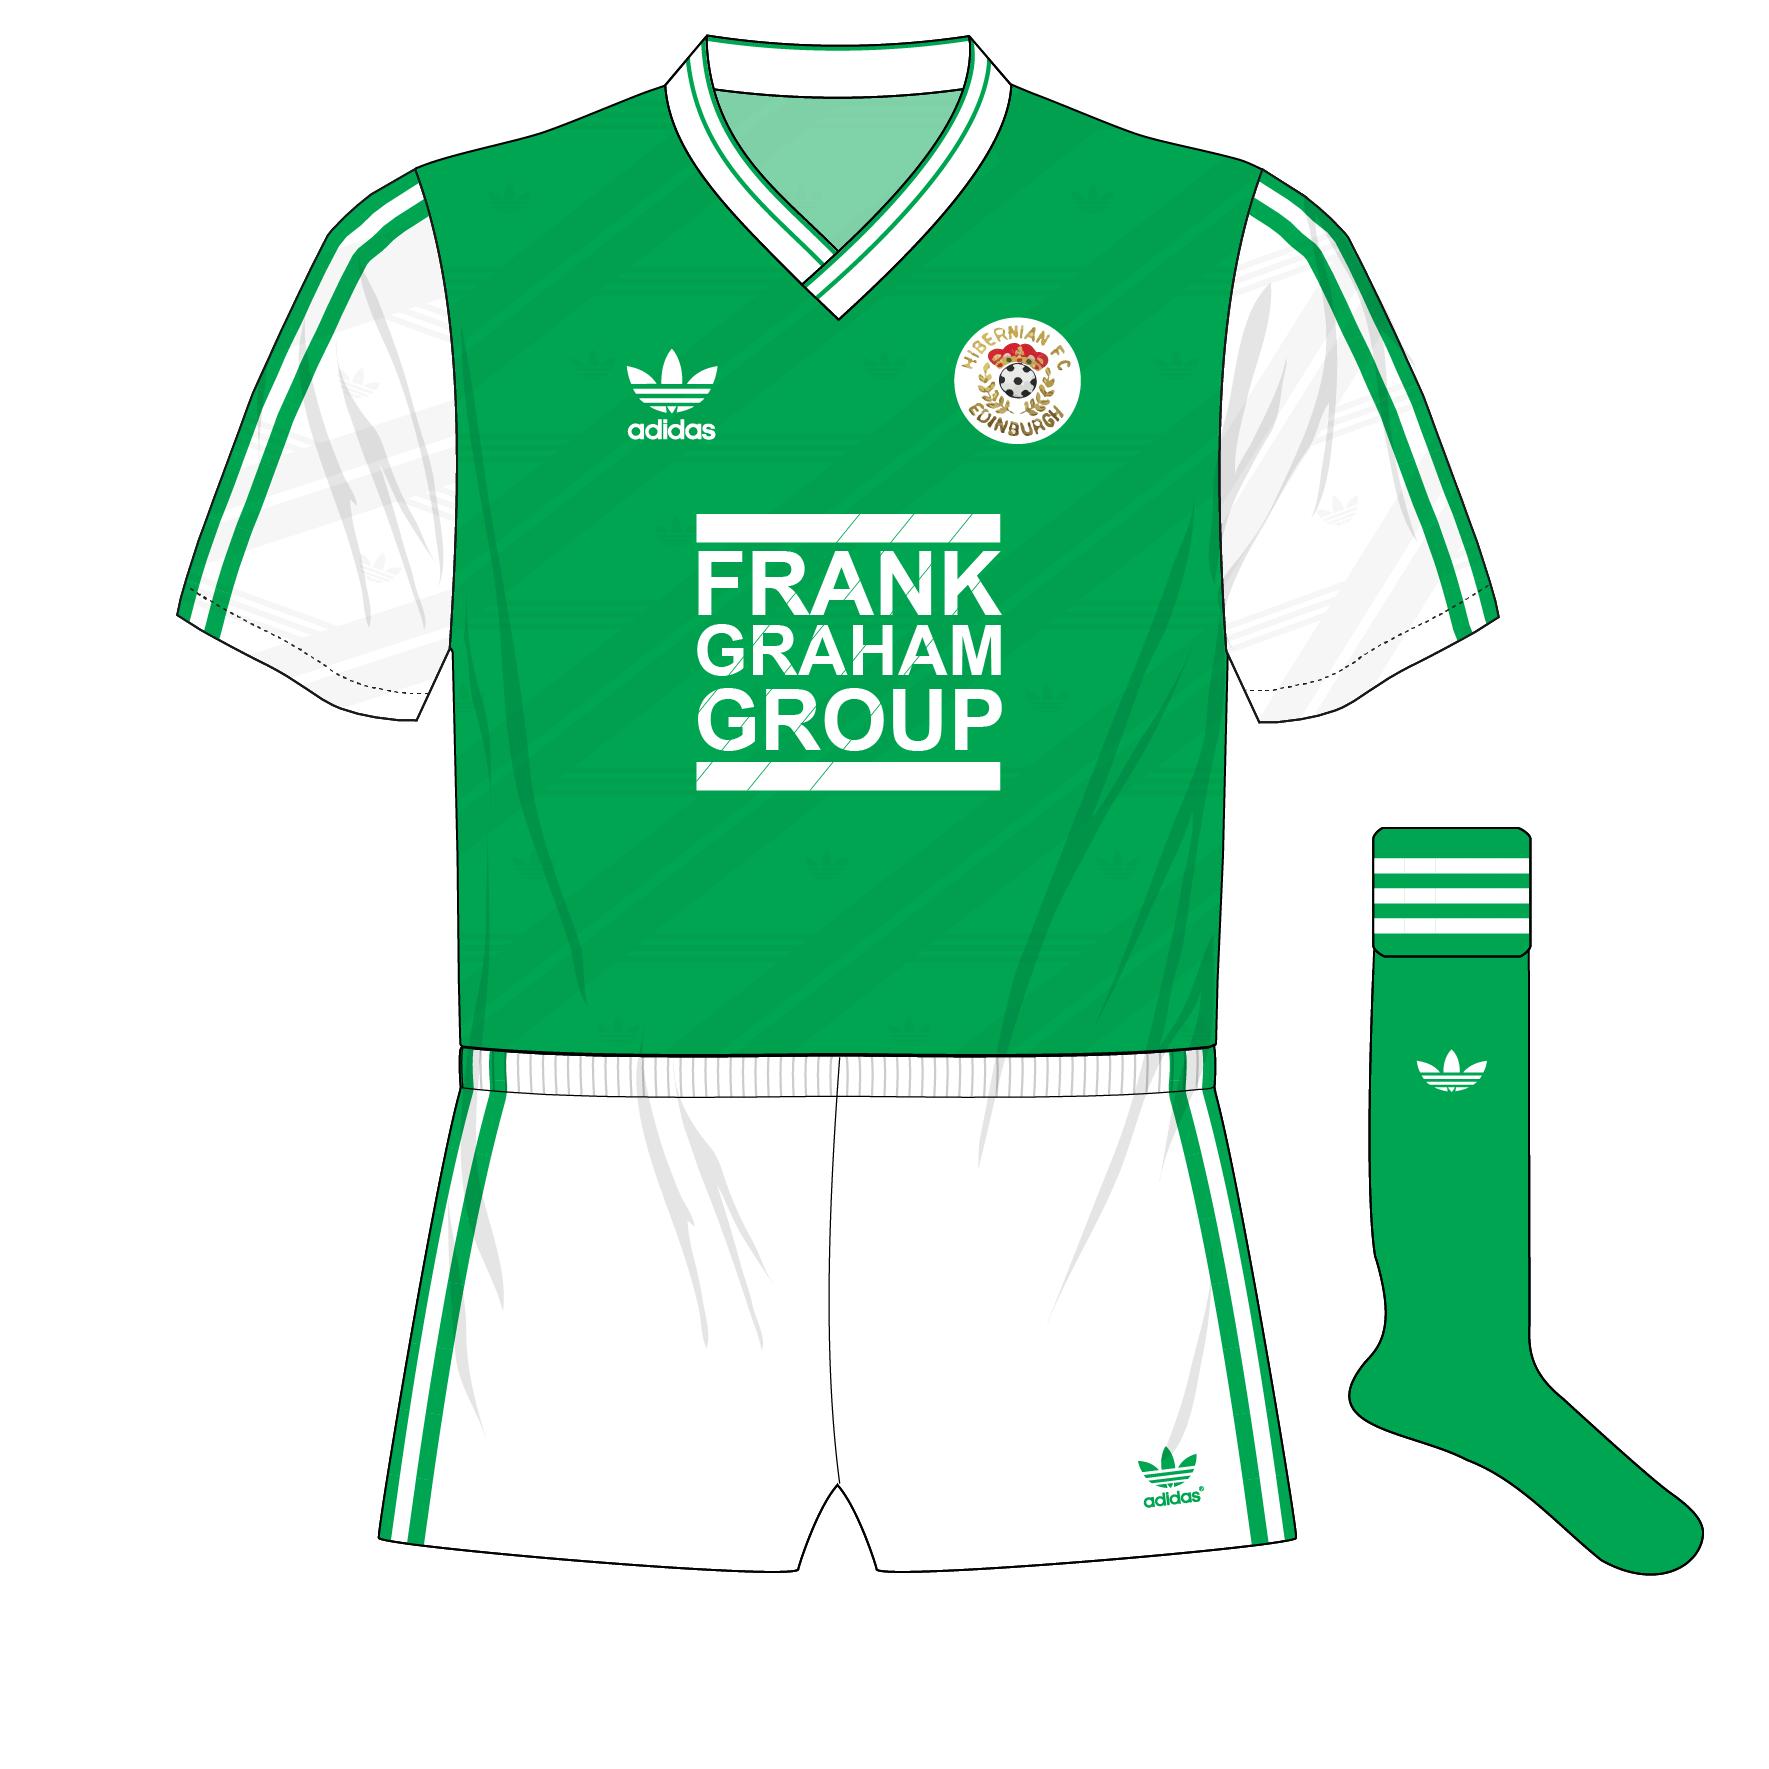 Hibernian-adidas-1987-1989-home-kit-shirt-Frank-Graham-Group